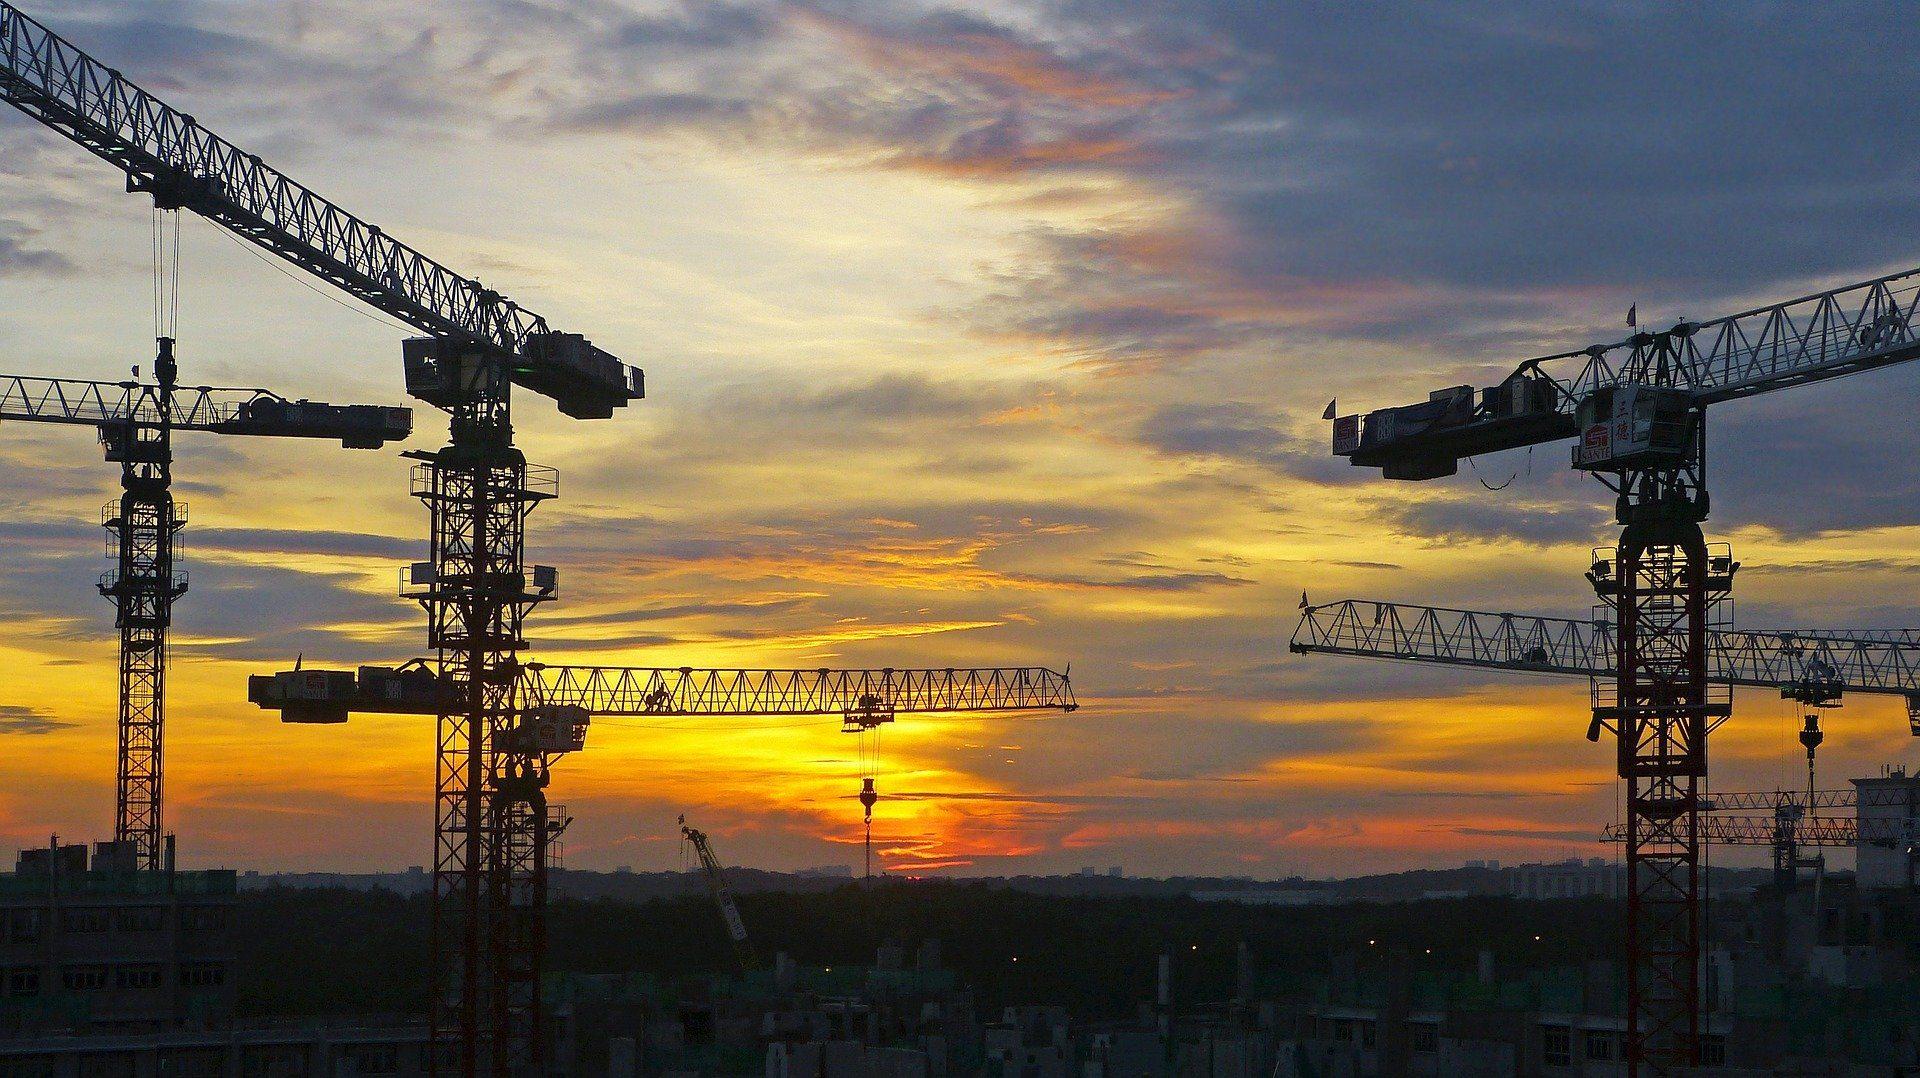 Image of construction cranes